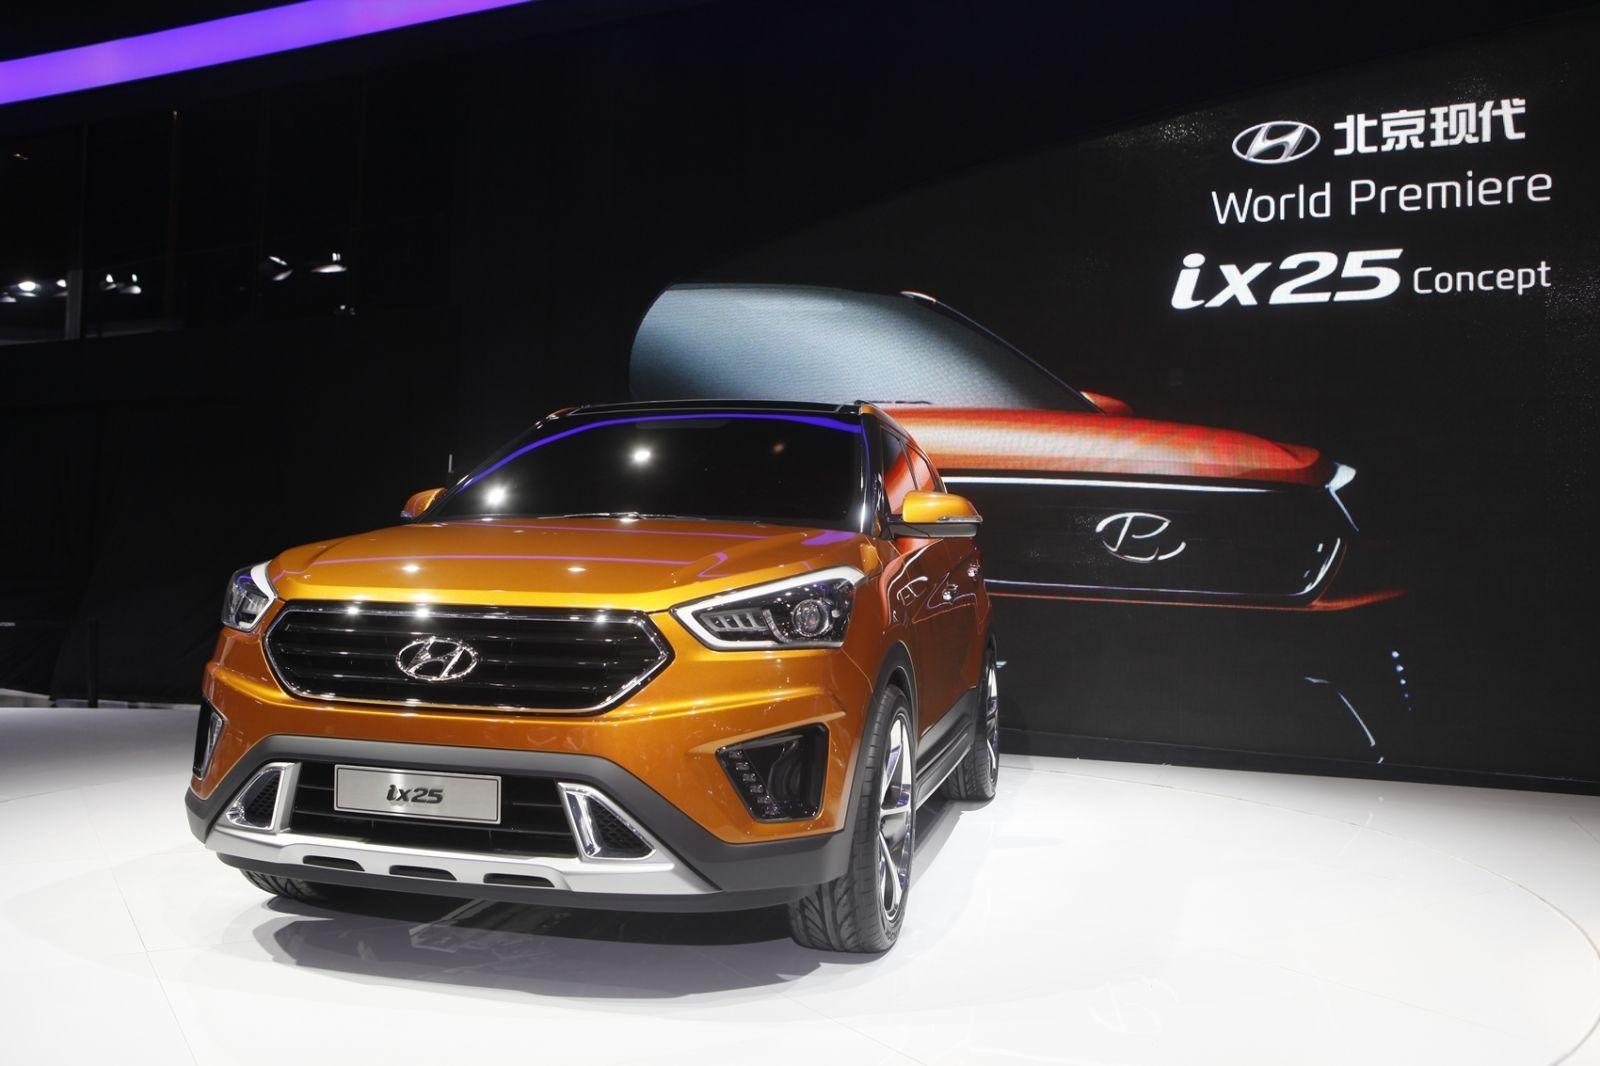 Hyundai ix25 concept showcased at the on going 2014 Auto